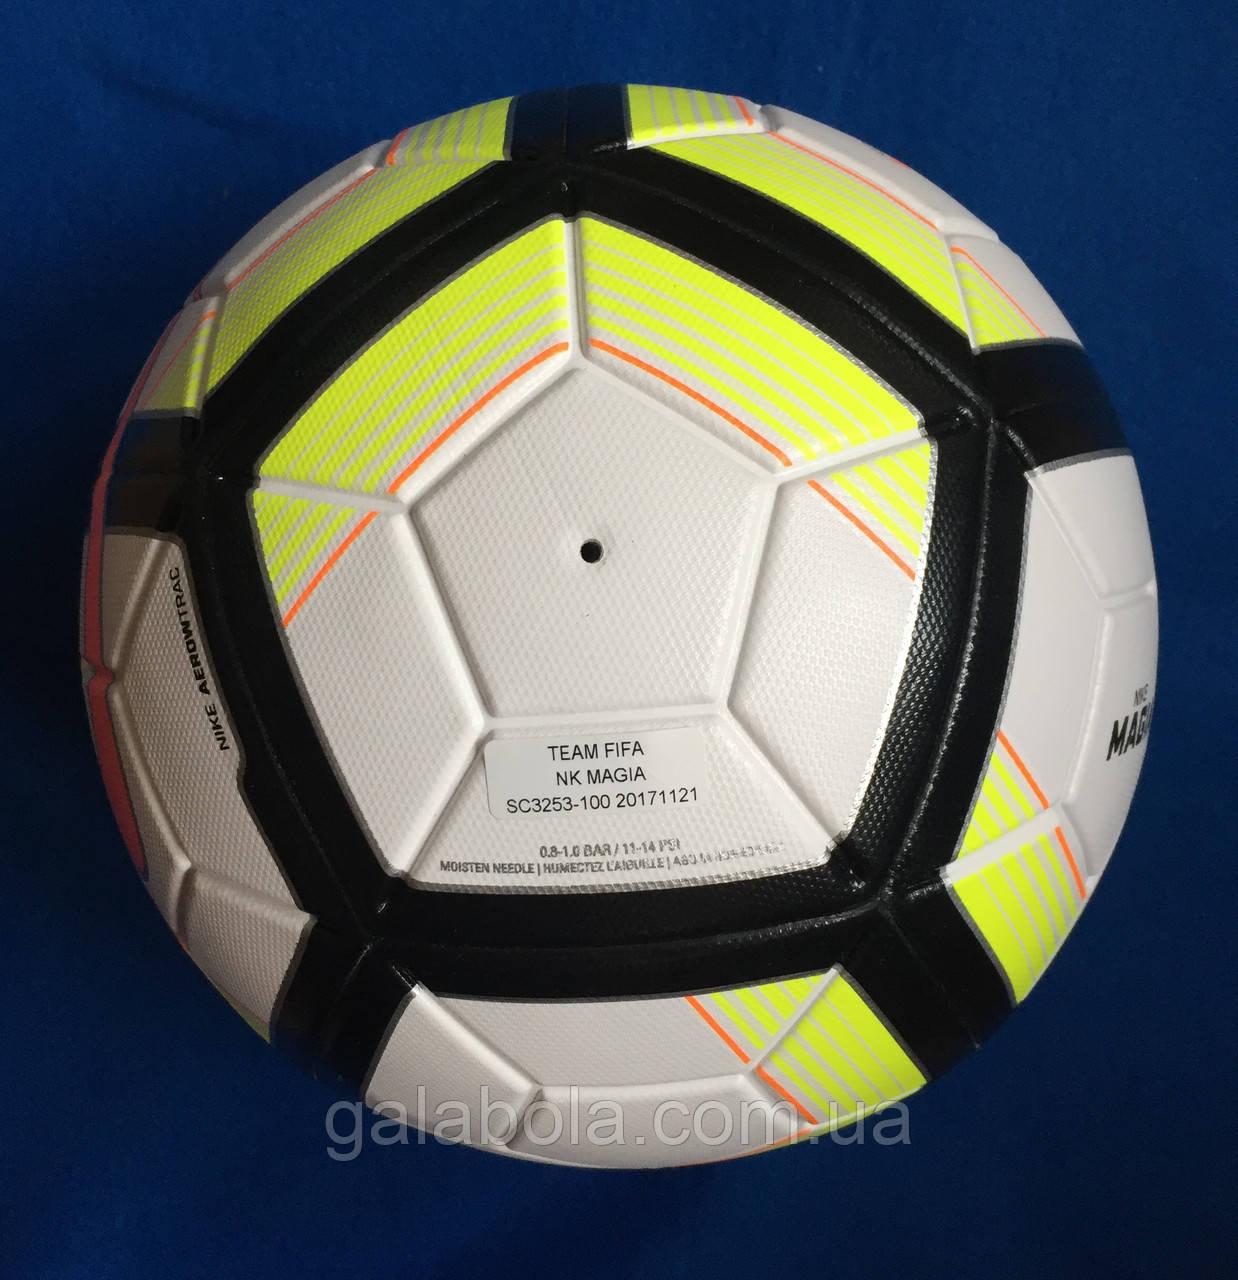 60b5f468 Мяч футбольный NIKE MAGIA TEAM FIFA SC3253-100 (размер 5), цена 1 130 грн.,  купить Київ — Prom.ua (ID#753004715)